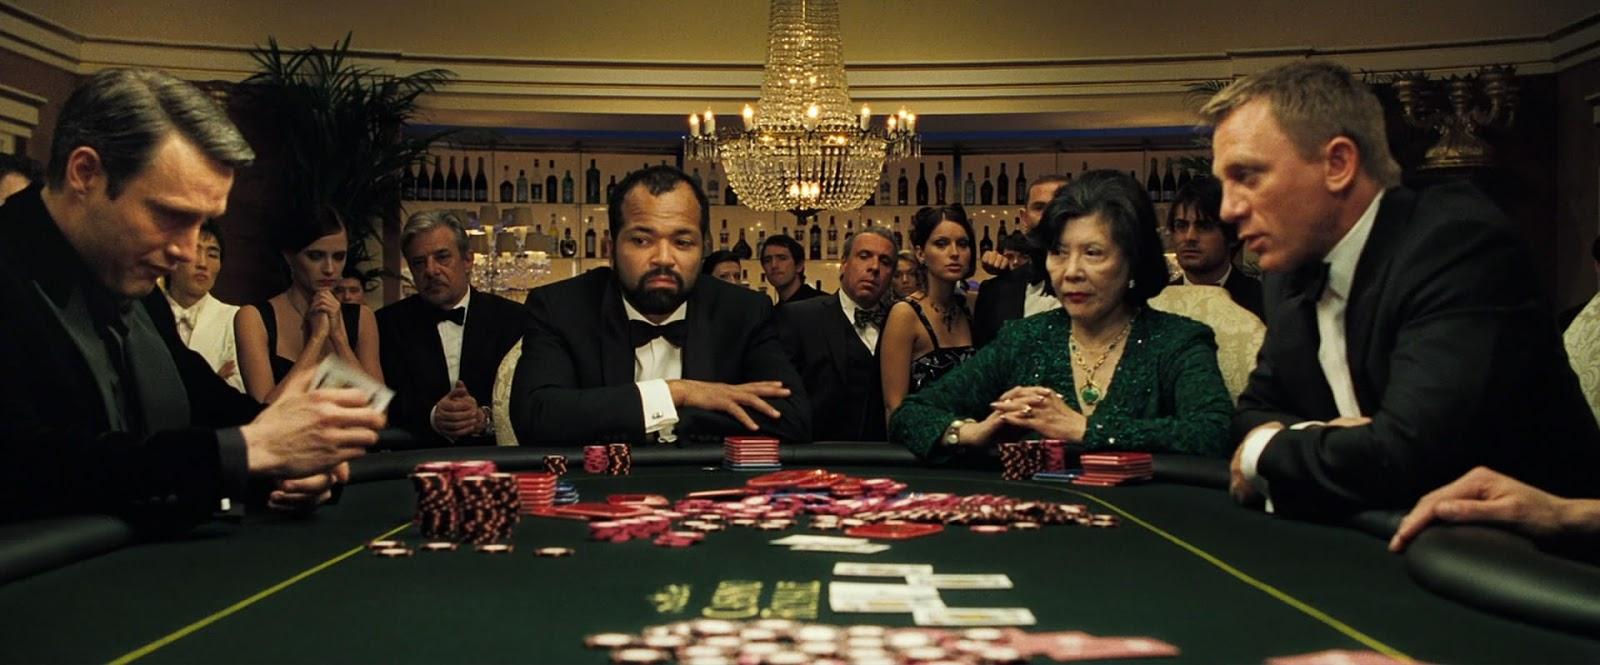 Casino royale zwiastun nr 1 polski